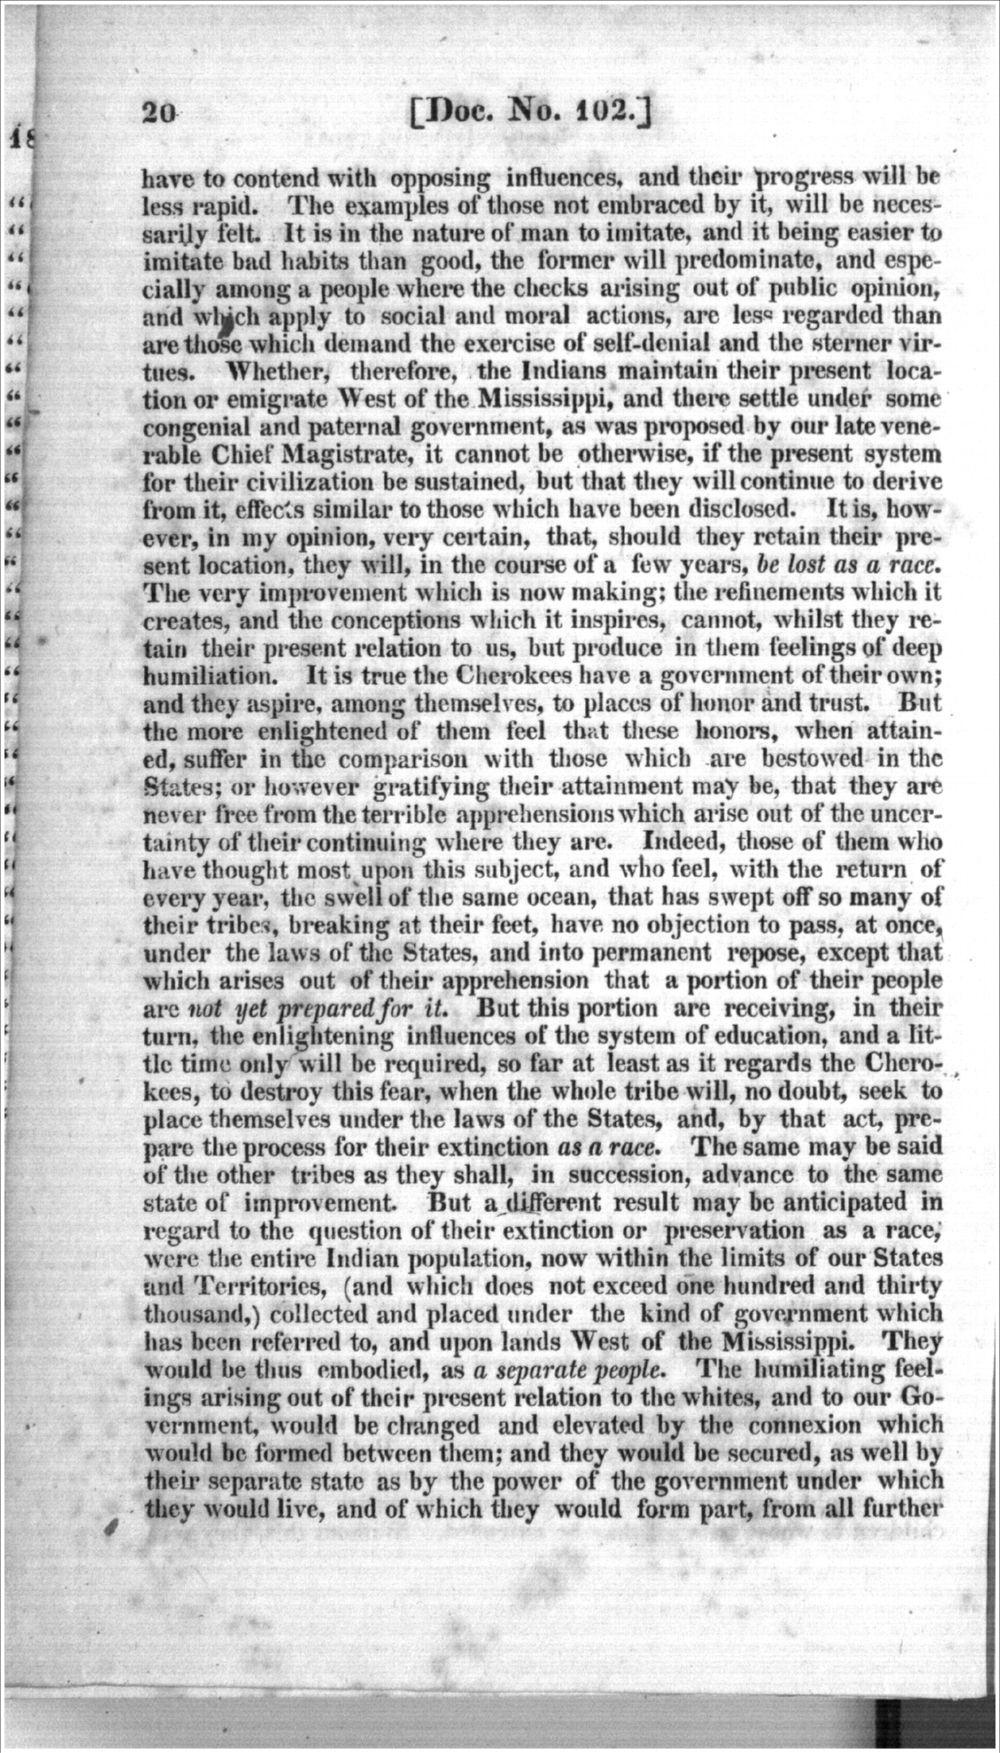 Thomas L. McKenney to James Barbour - 6